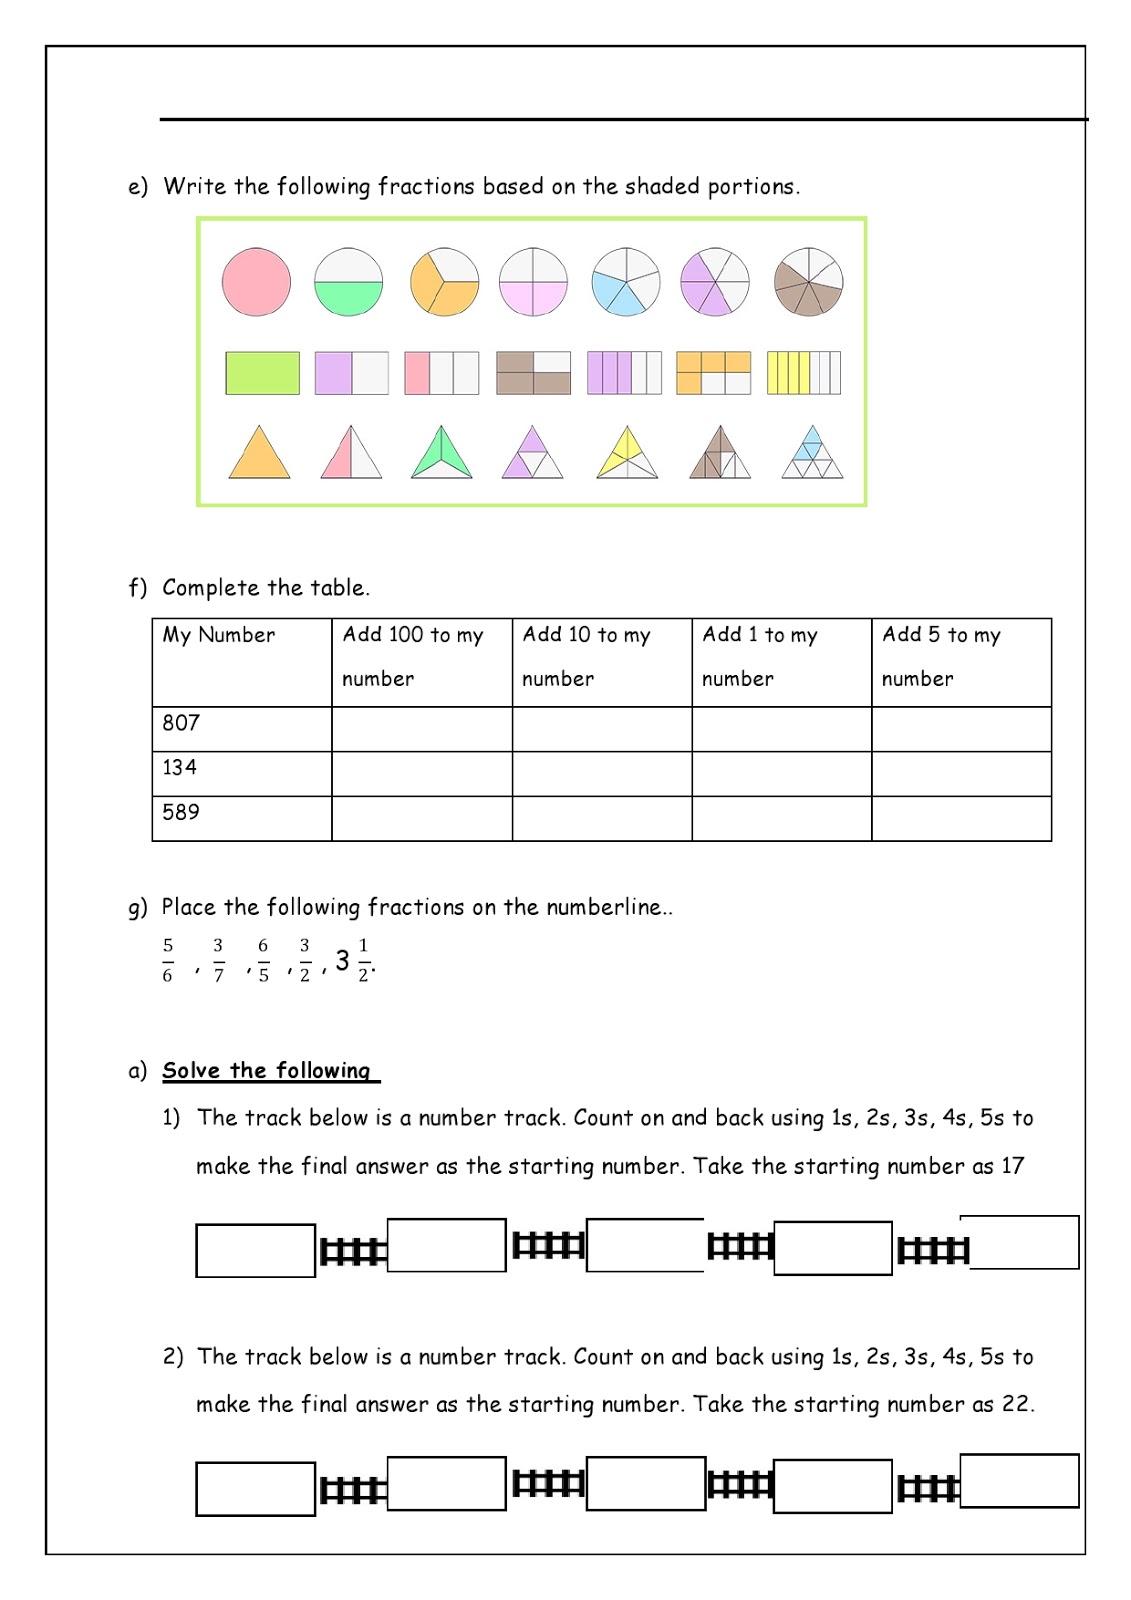 Birla World School Oman Revision Worksheets For Grade 3 As On 26 10